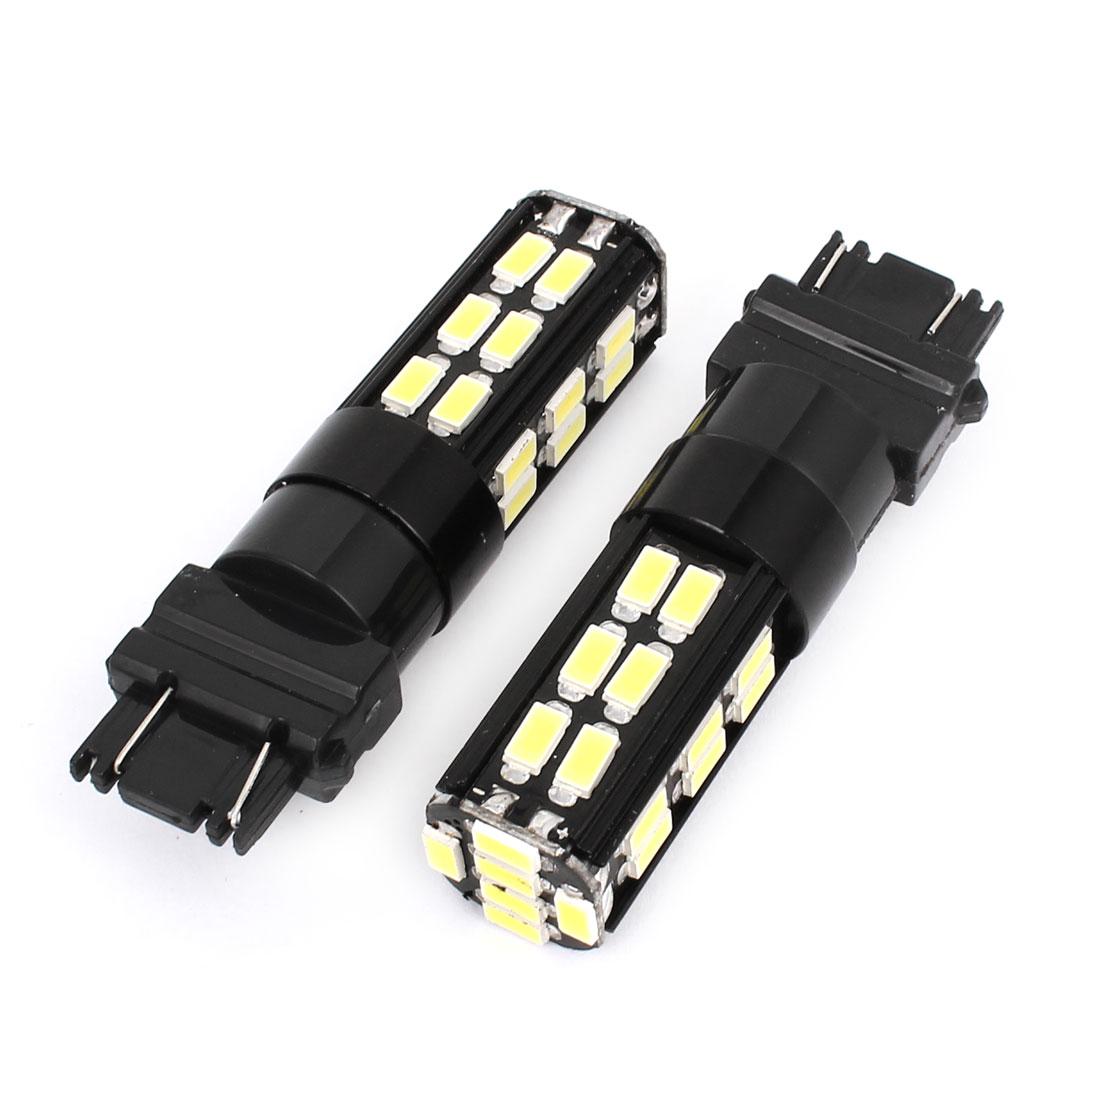 Pair 12-24V No Error 3157 Car White 30 5630 SMD LED Light Turn Signal Tail Lamp